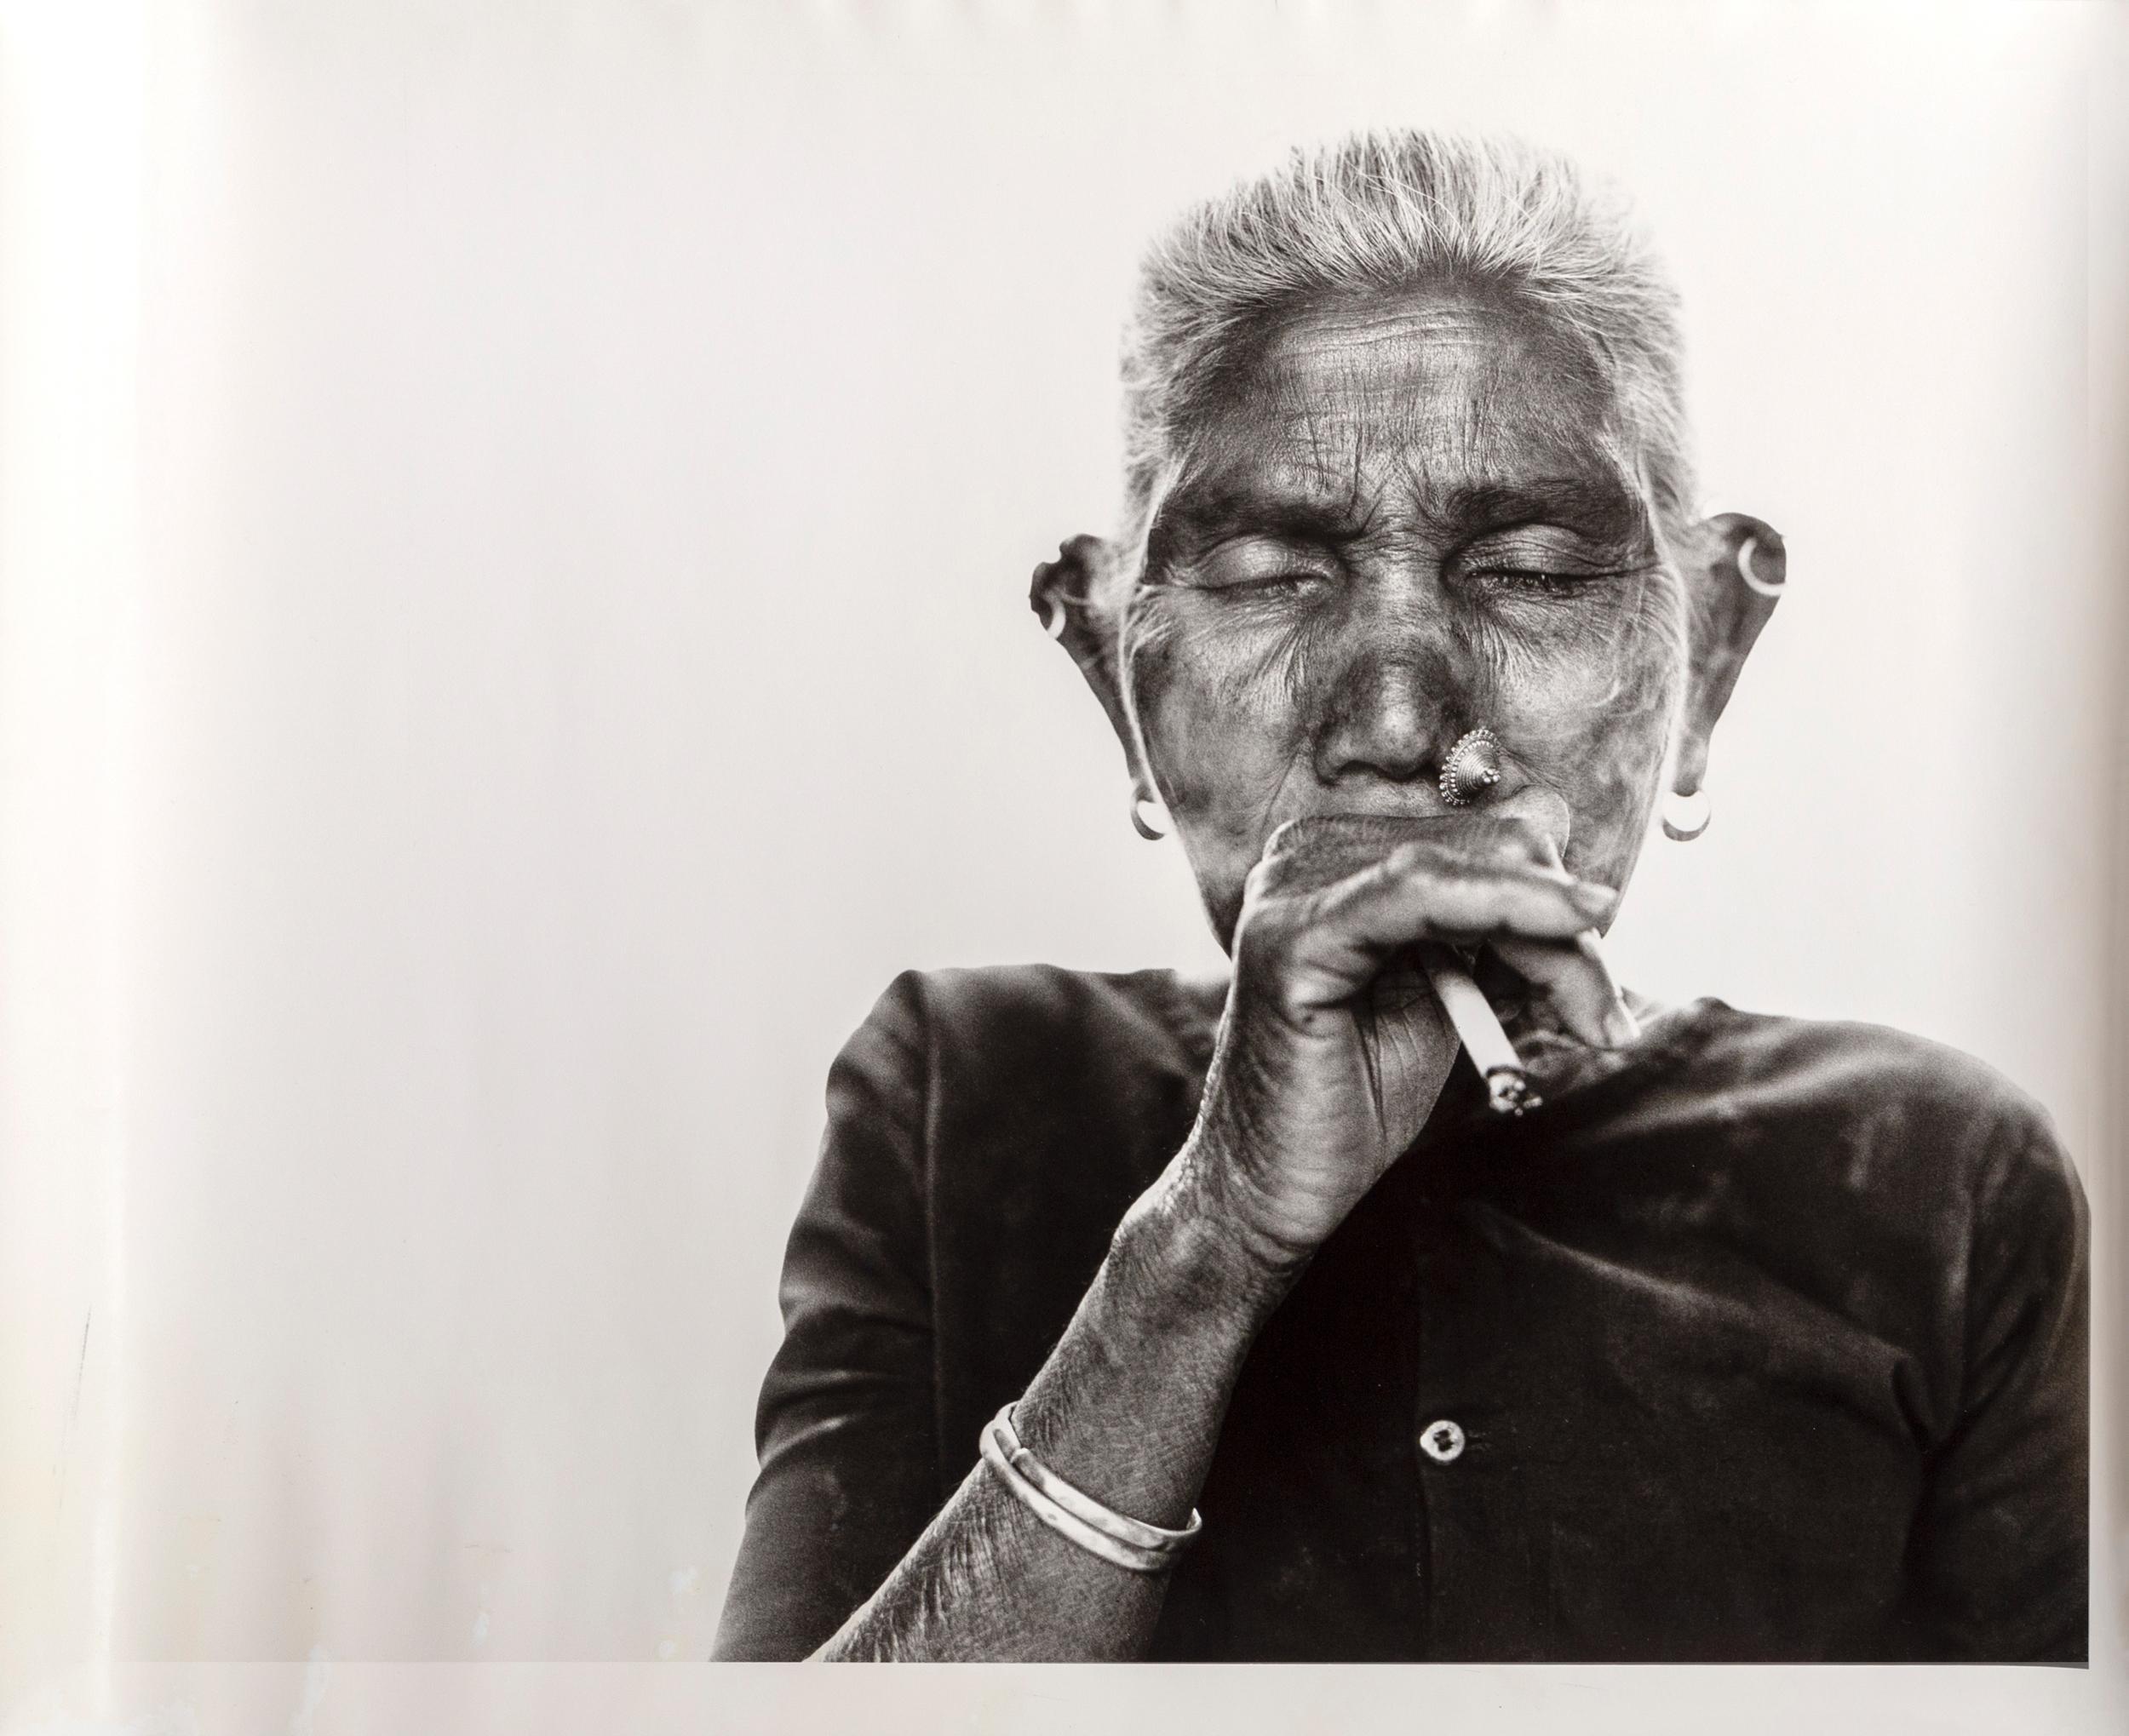 Gerald Forster, Smoke, Nepal, Photograph